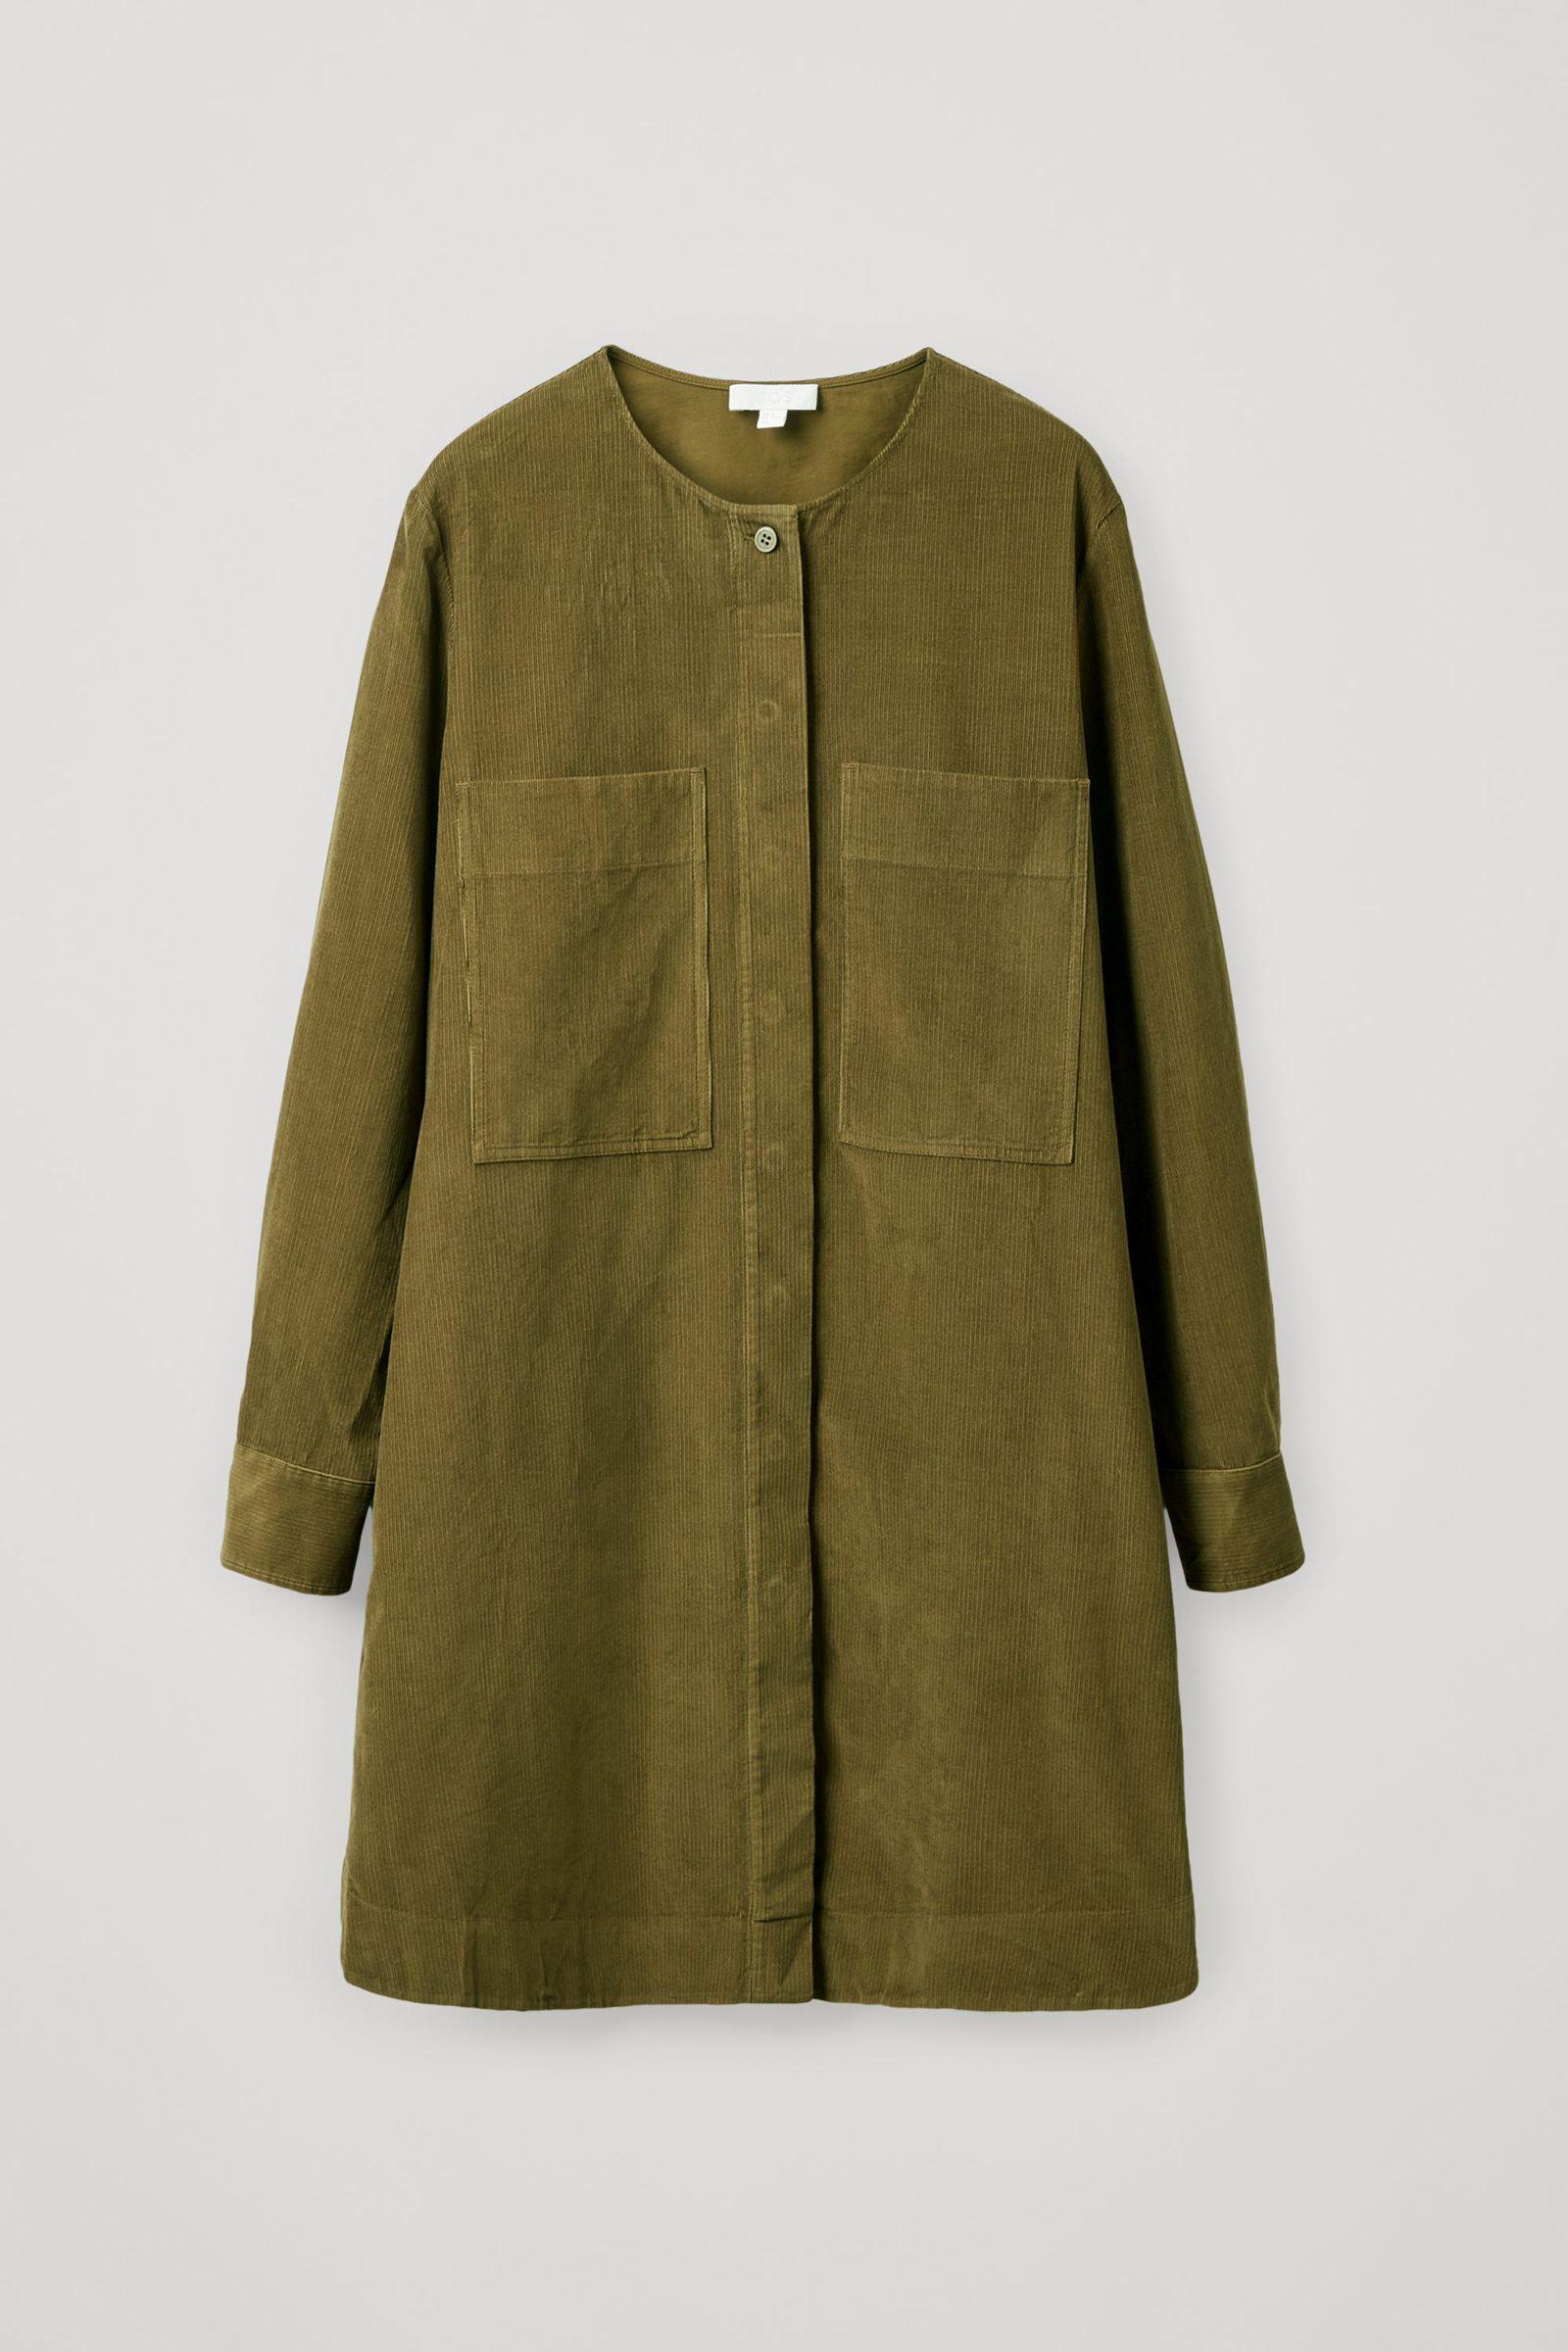 COS A라인 코튼 코듀로이 셔츠 드레스의 카키 그린컬러 Product입니다.